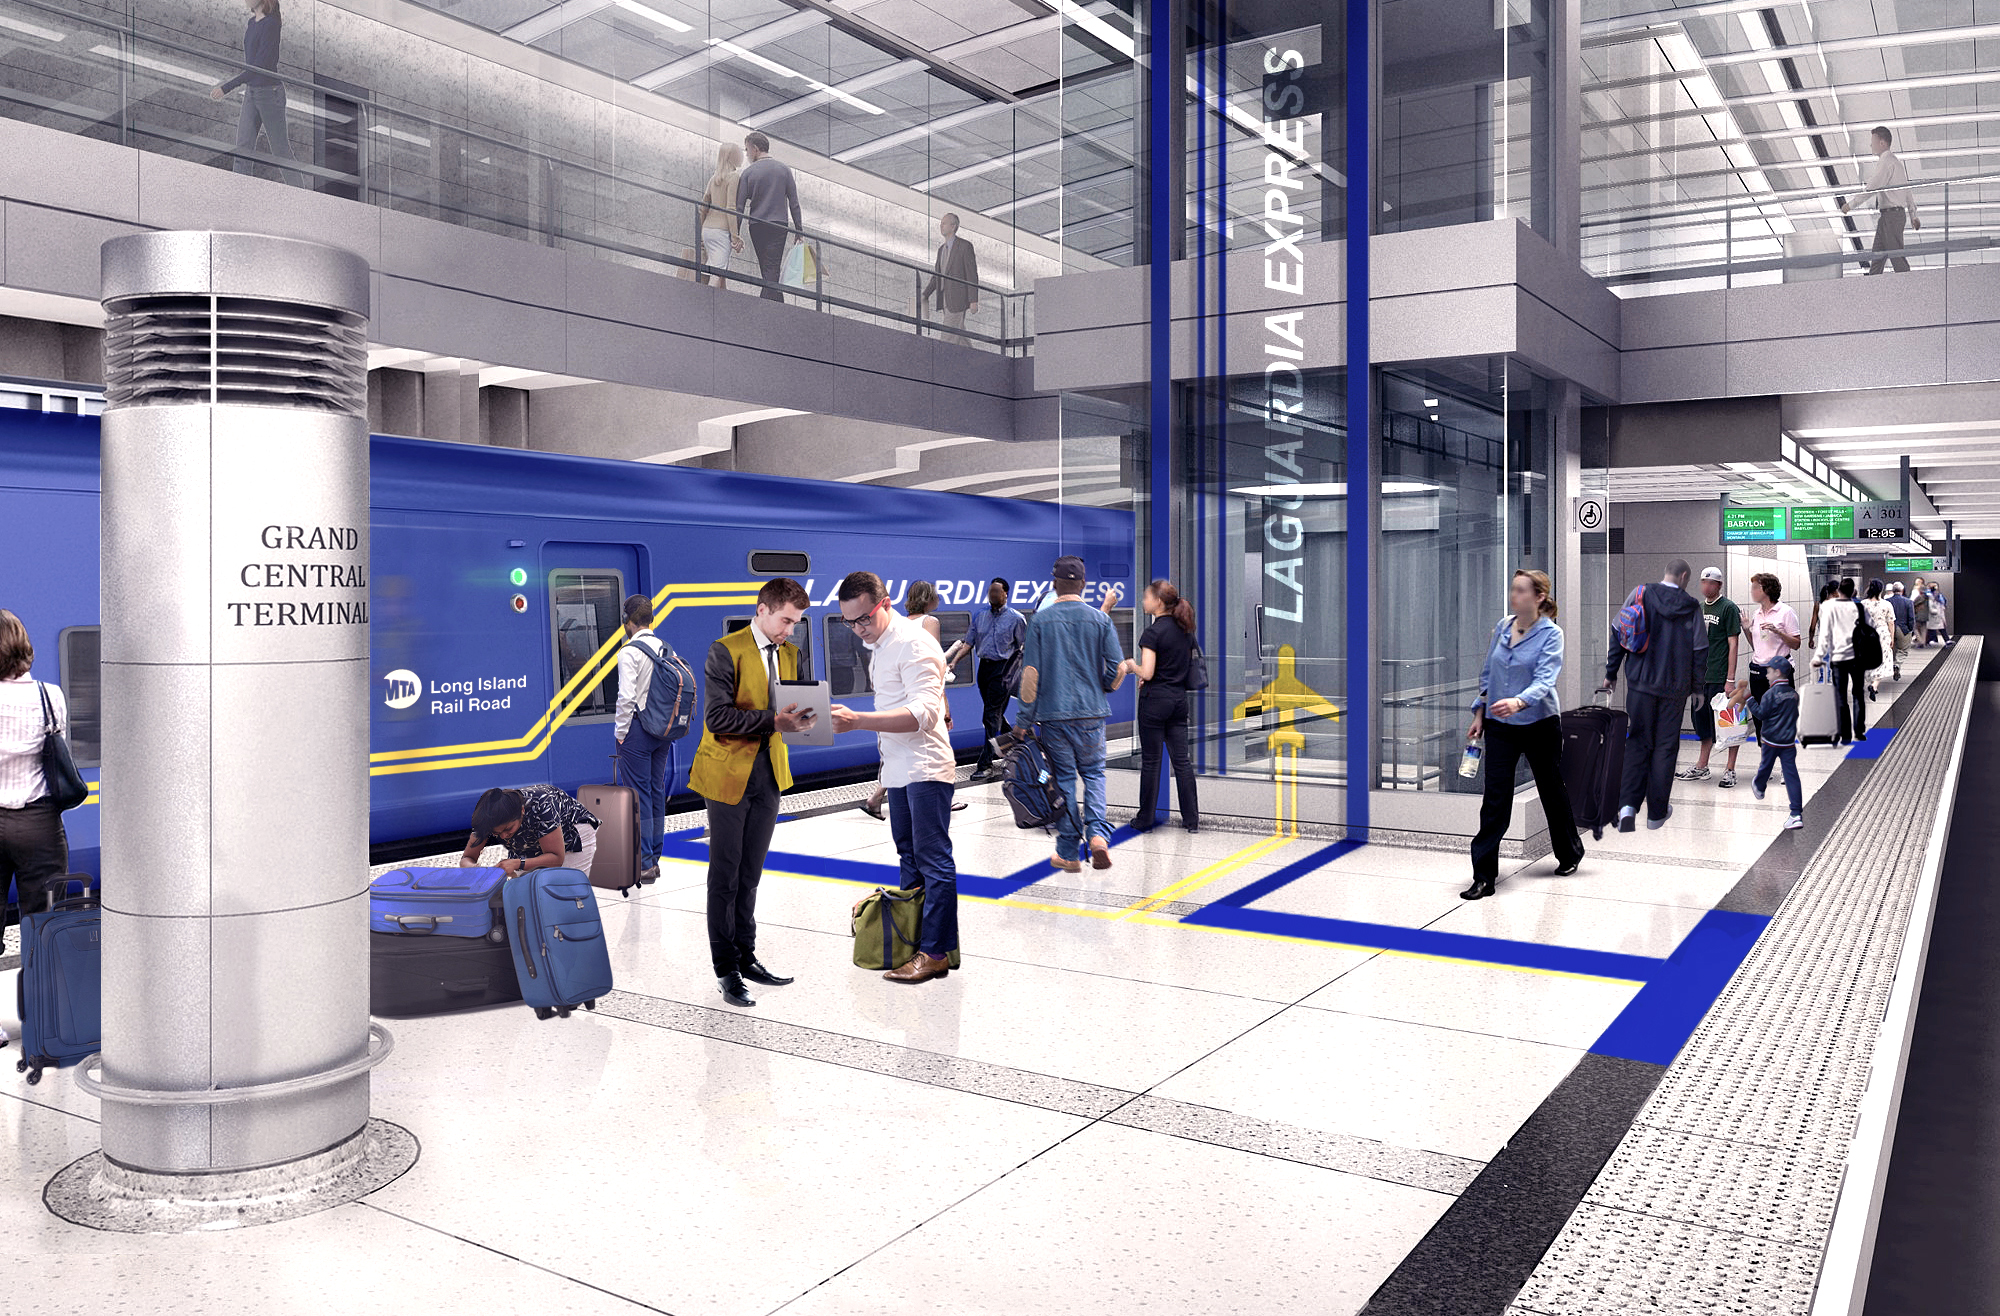 LaGuardia Express at Grand Central Terminal